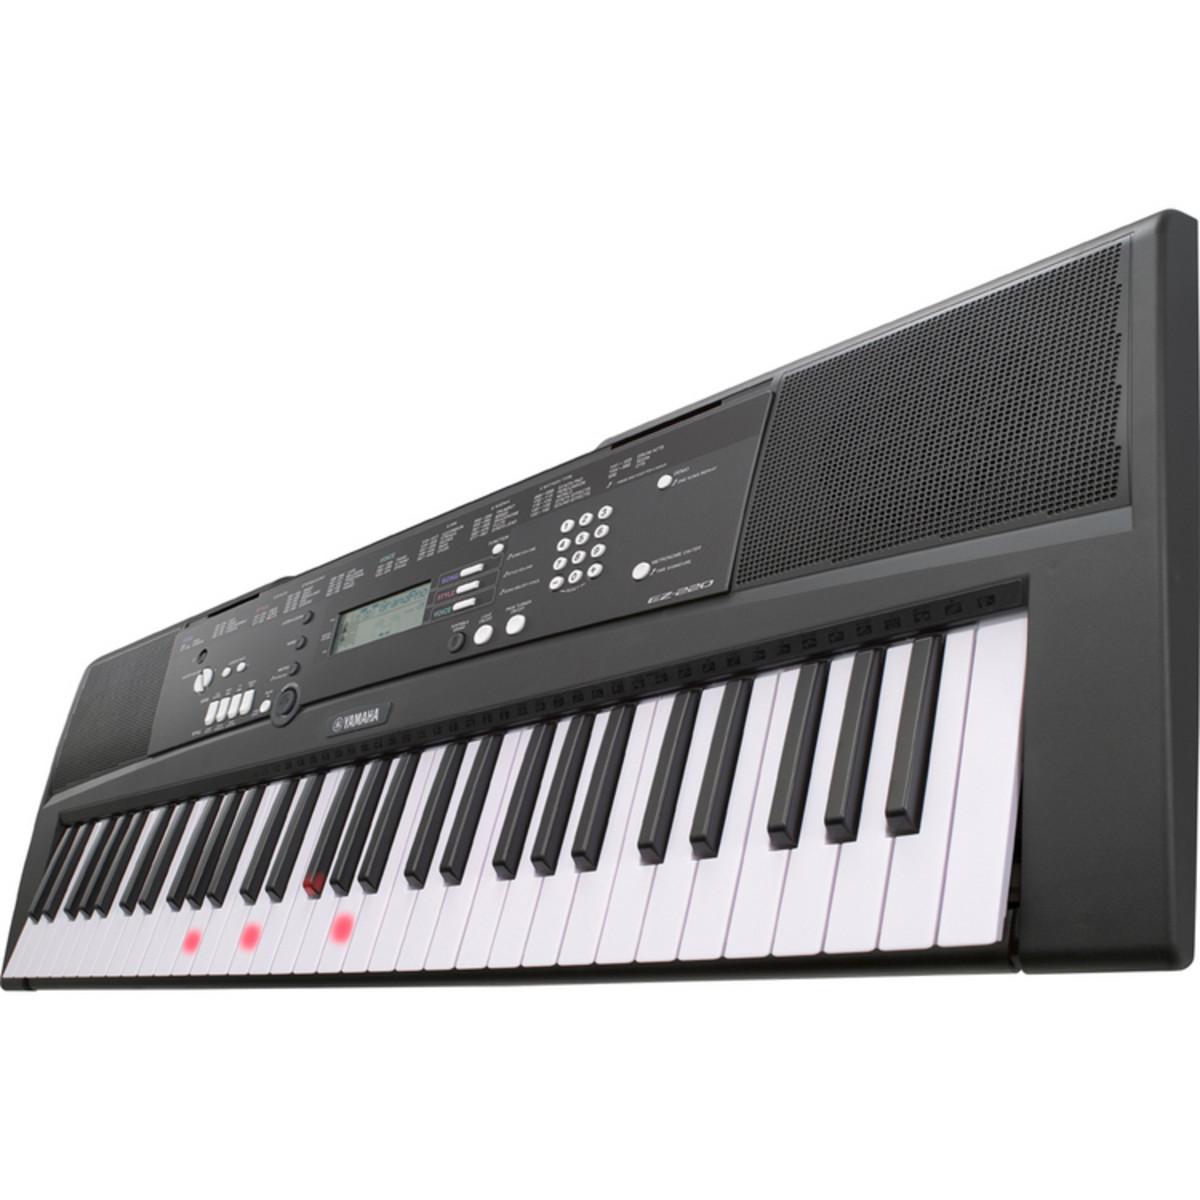 Yamaha ez220 61 key keylighting keyboard nearly new at for How to repair yamaha keyboard